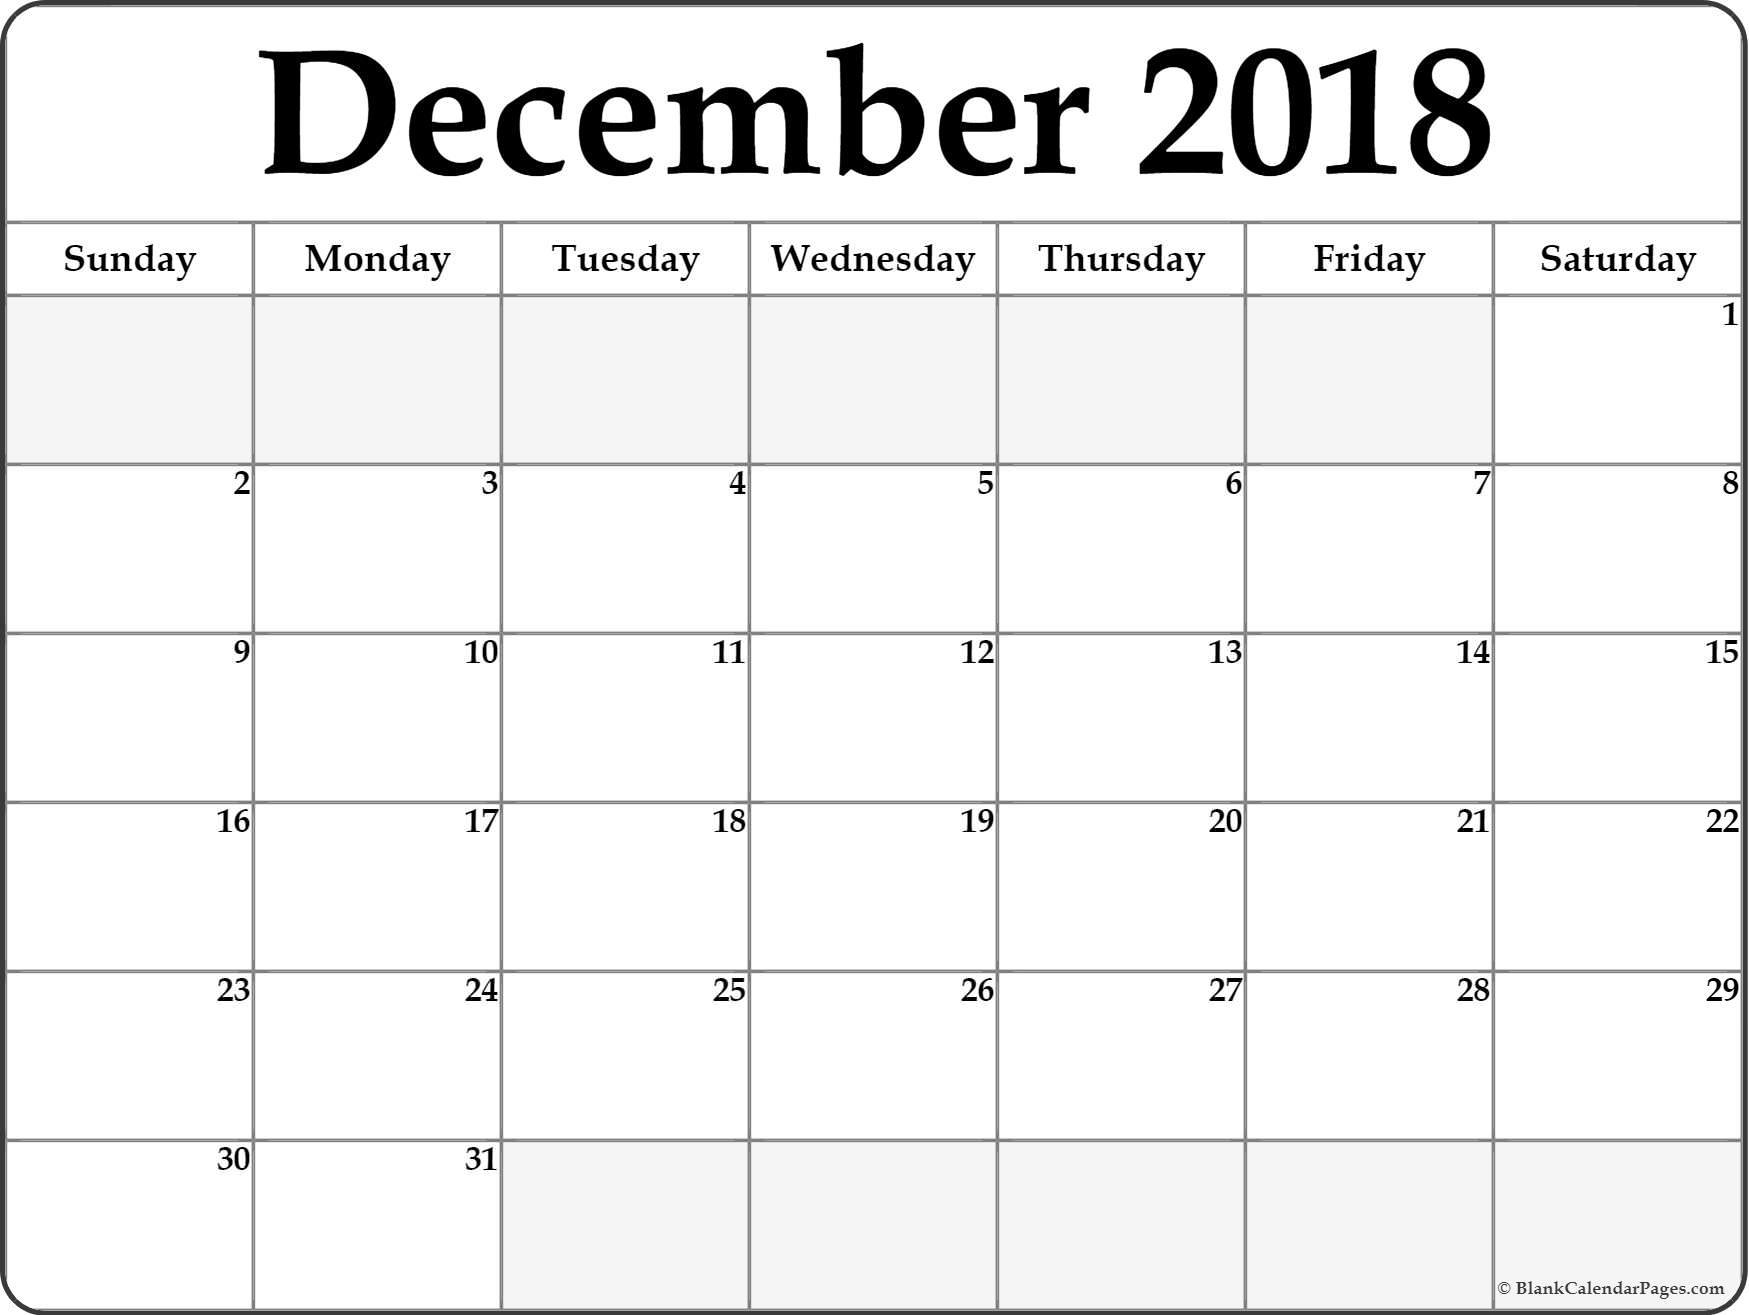 December 2018 Calendar Printable- Free Templates - Printable with regard to Dec Calendar Printable Template